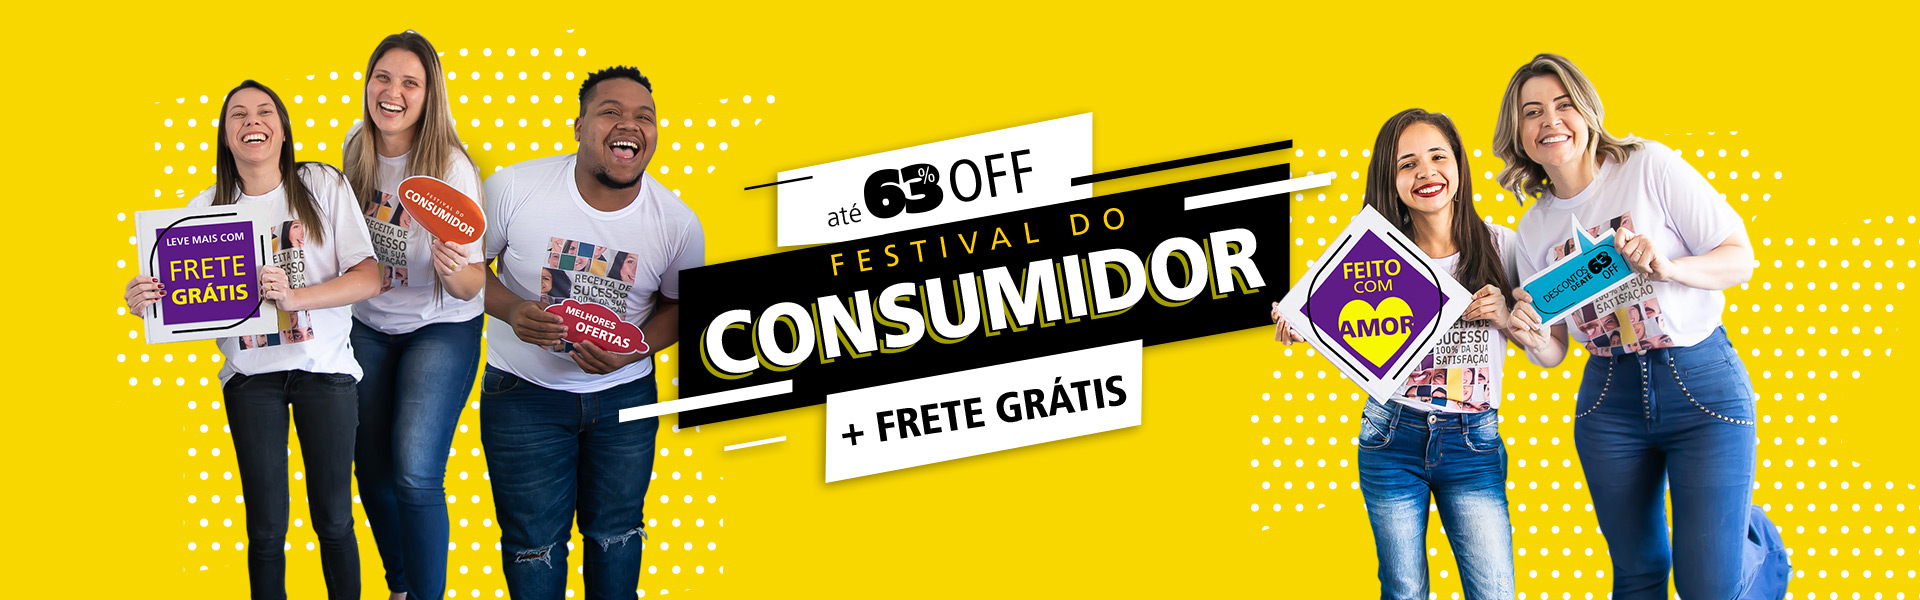 Promoções - Phooto Brasil